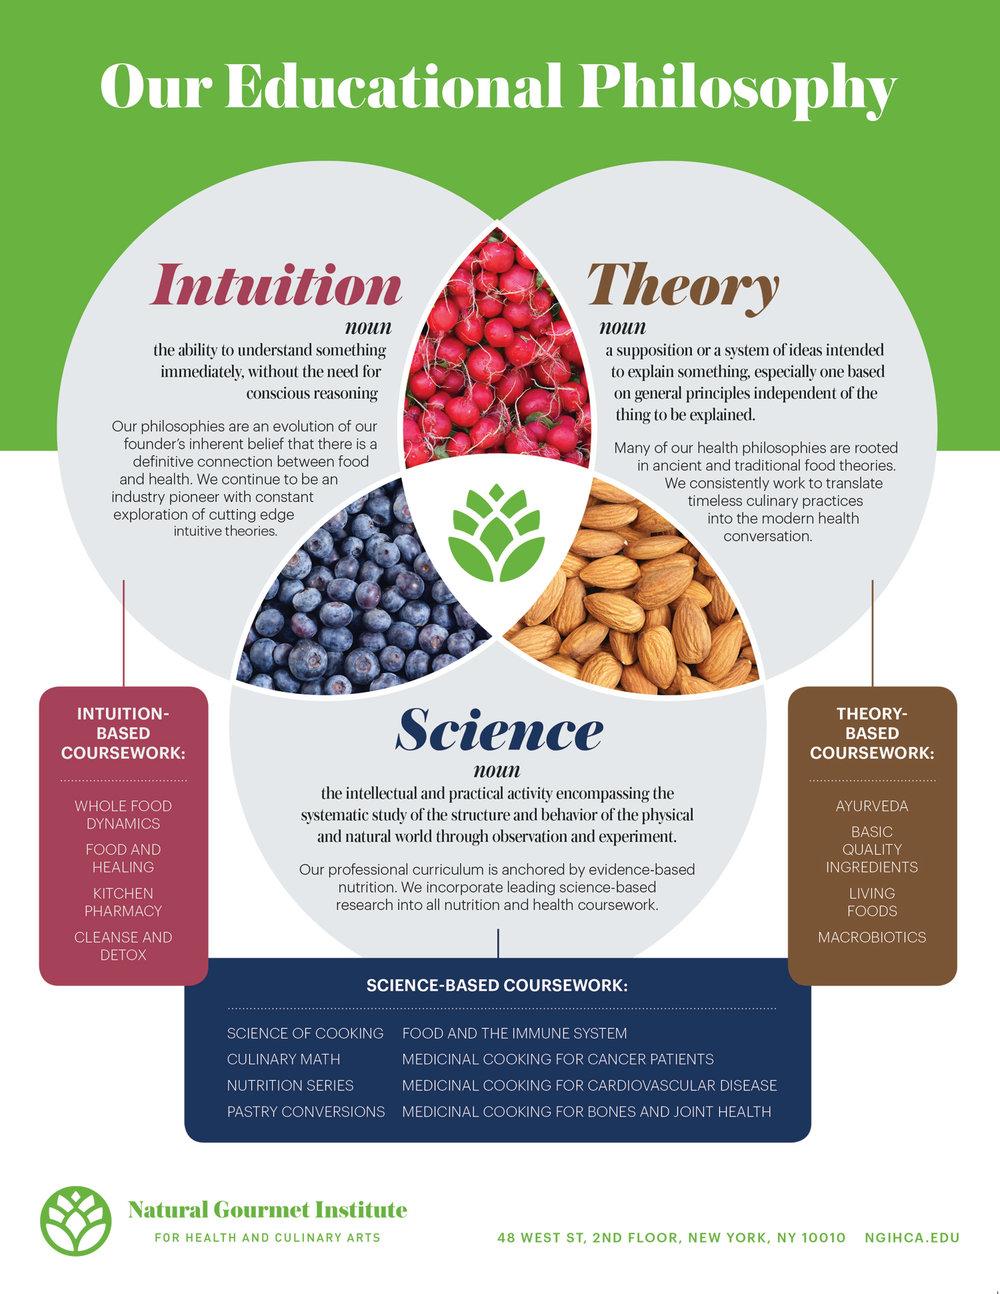 NGI-infographic5.jpg